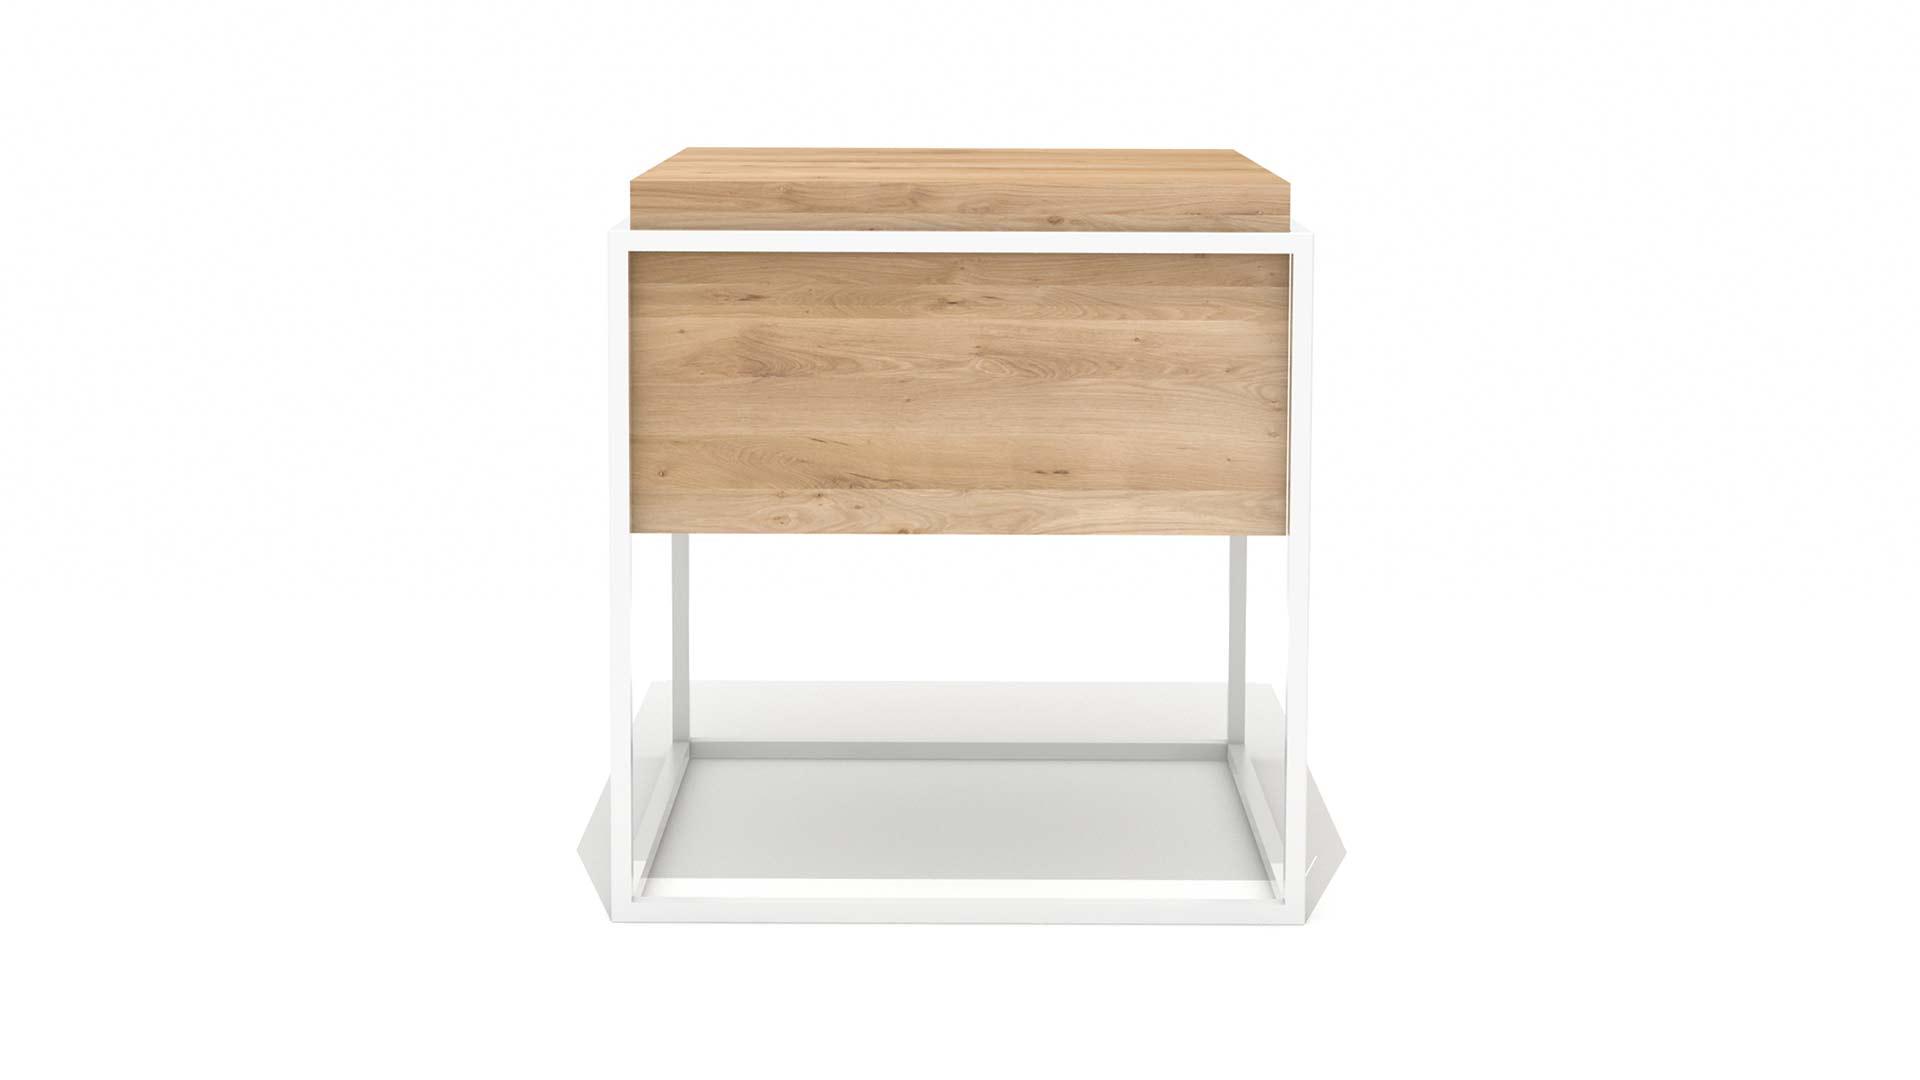 Ethnicraft-Monolit-bedside-table